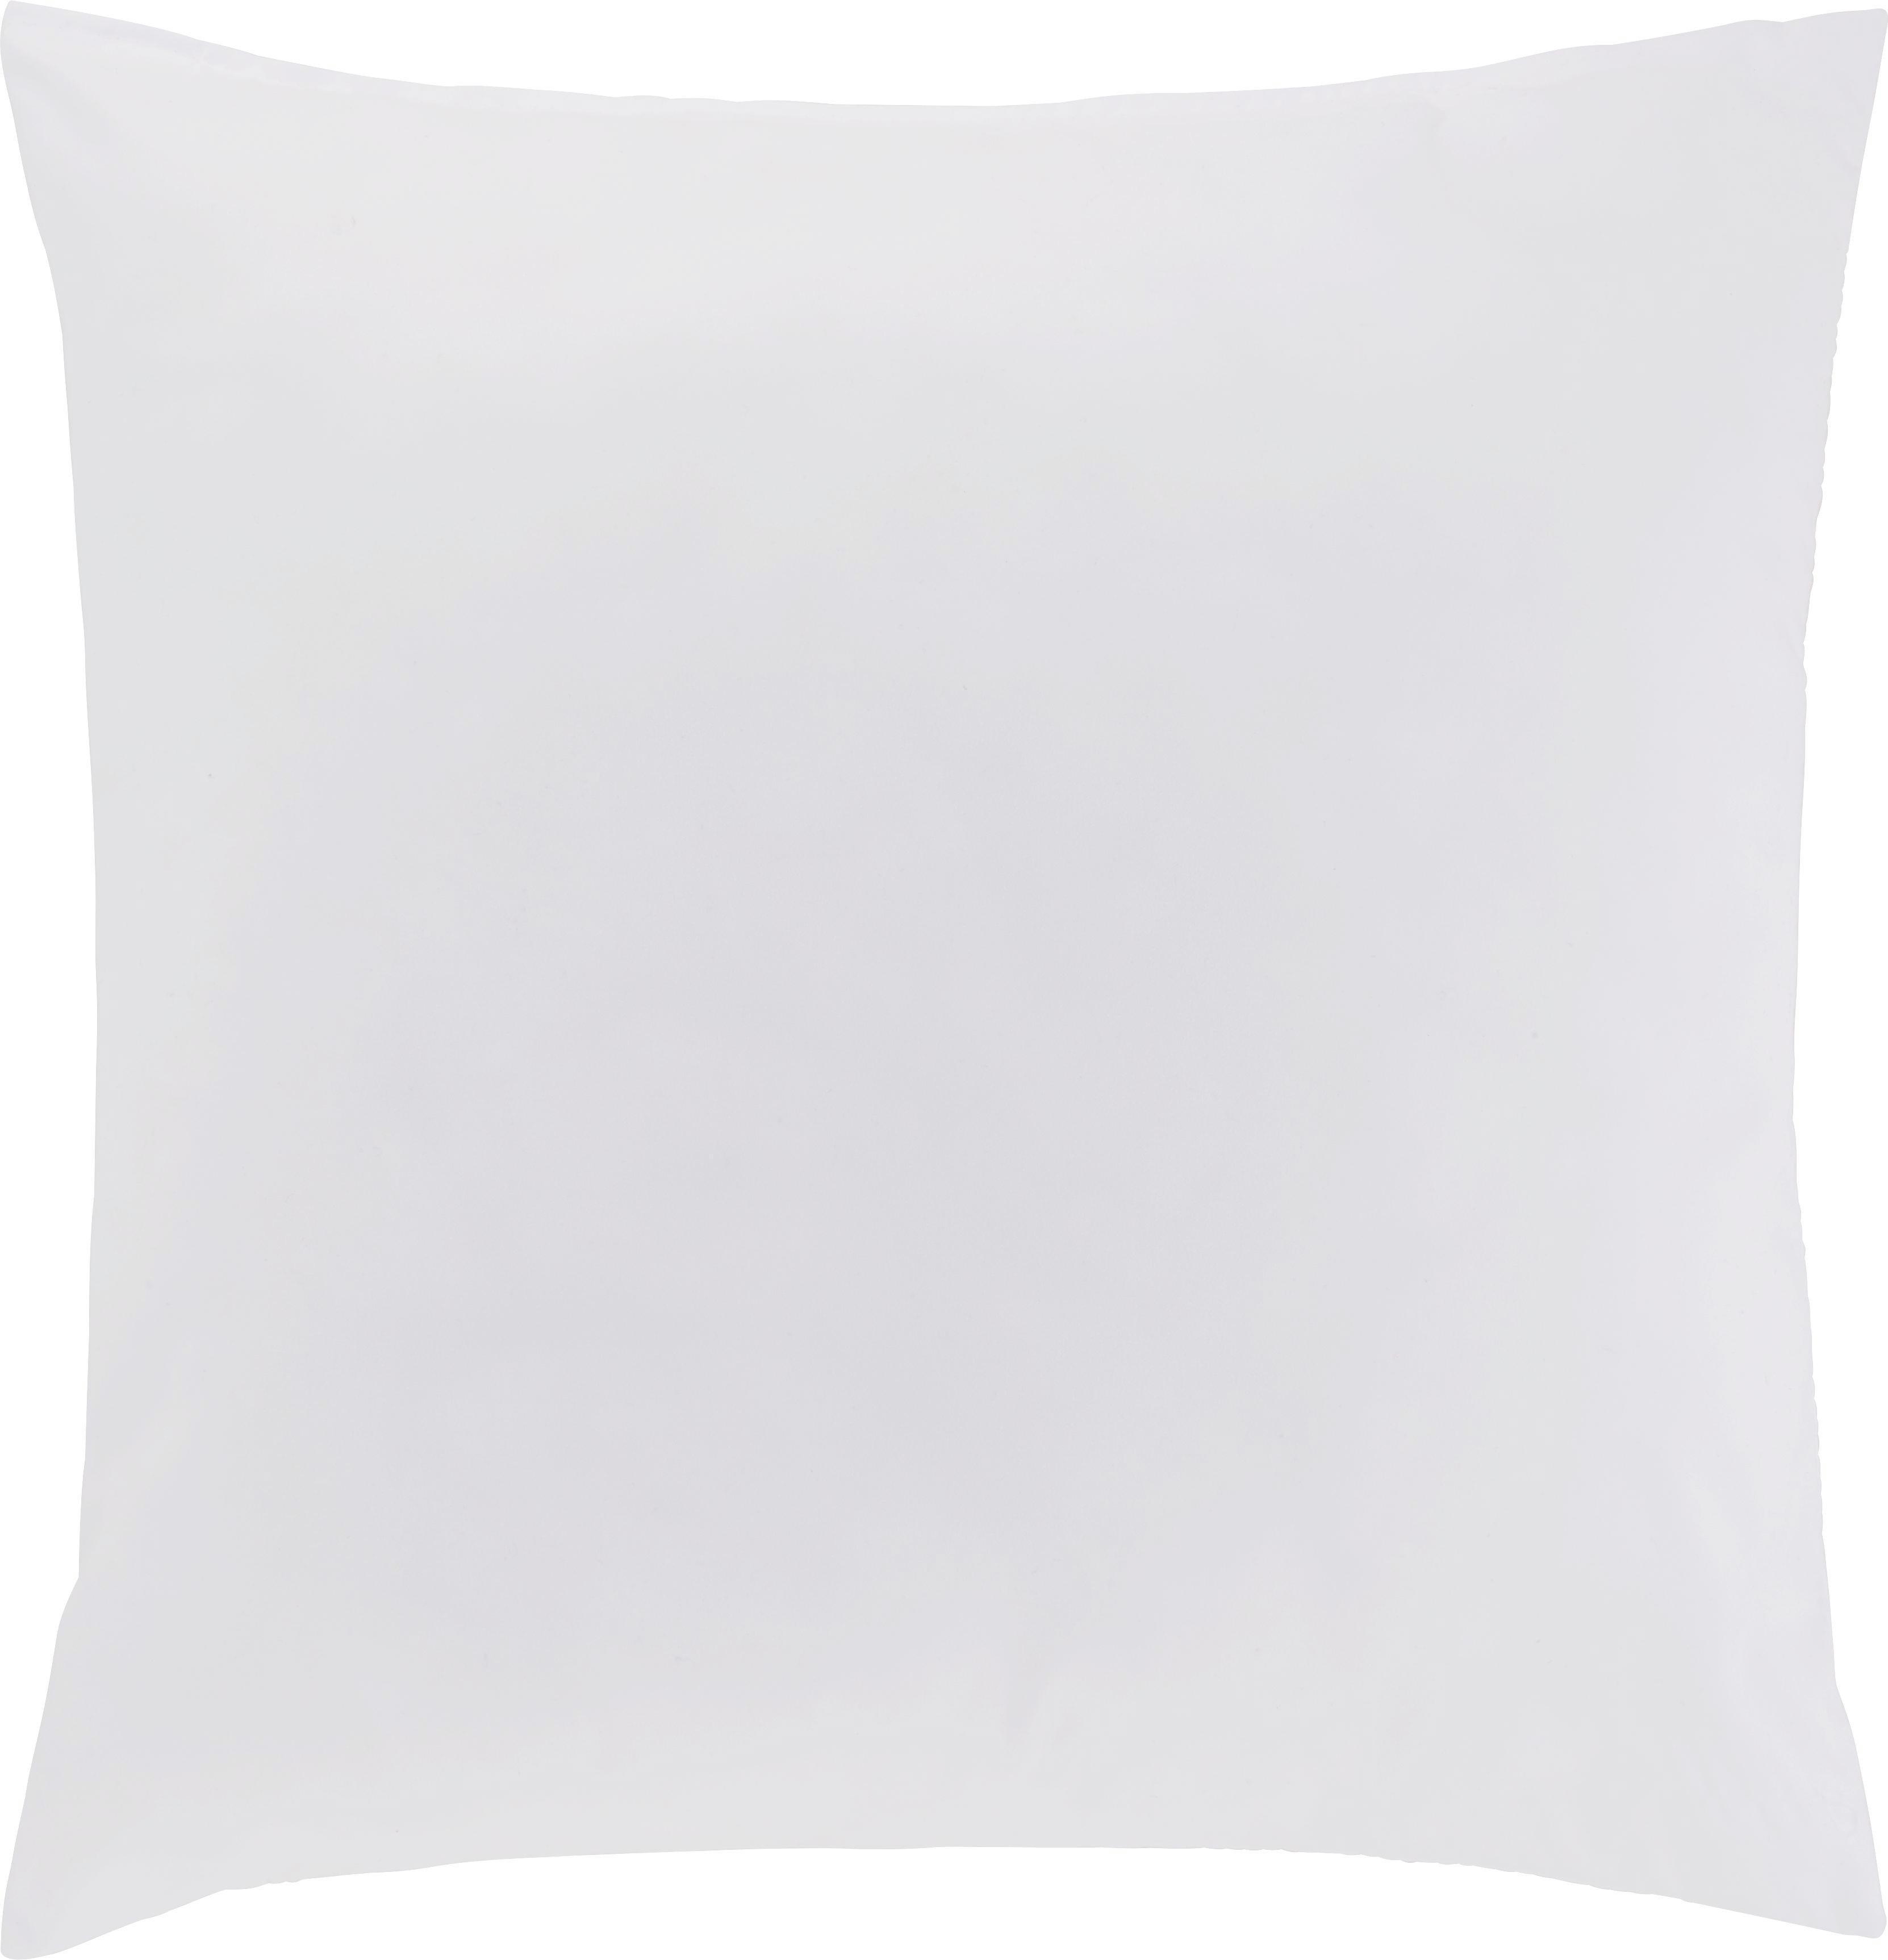 Polster Ani in Weiß, ca. 50x50cm - Weiß, Textil (50/50cm) - MÖMAX modern living